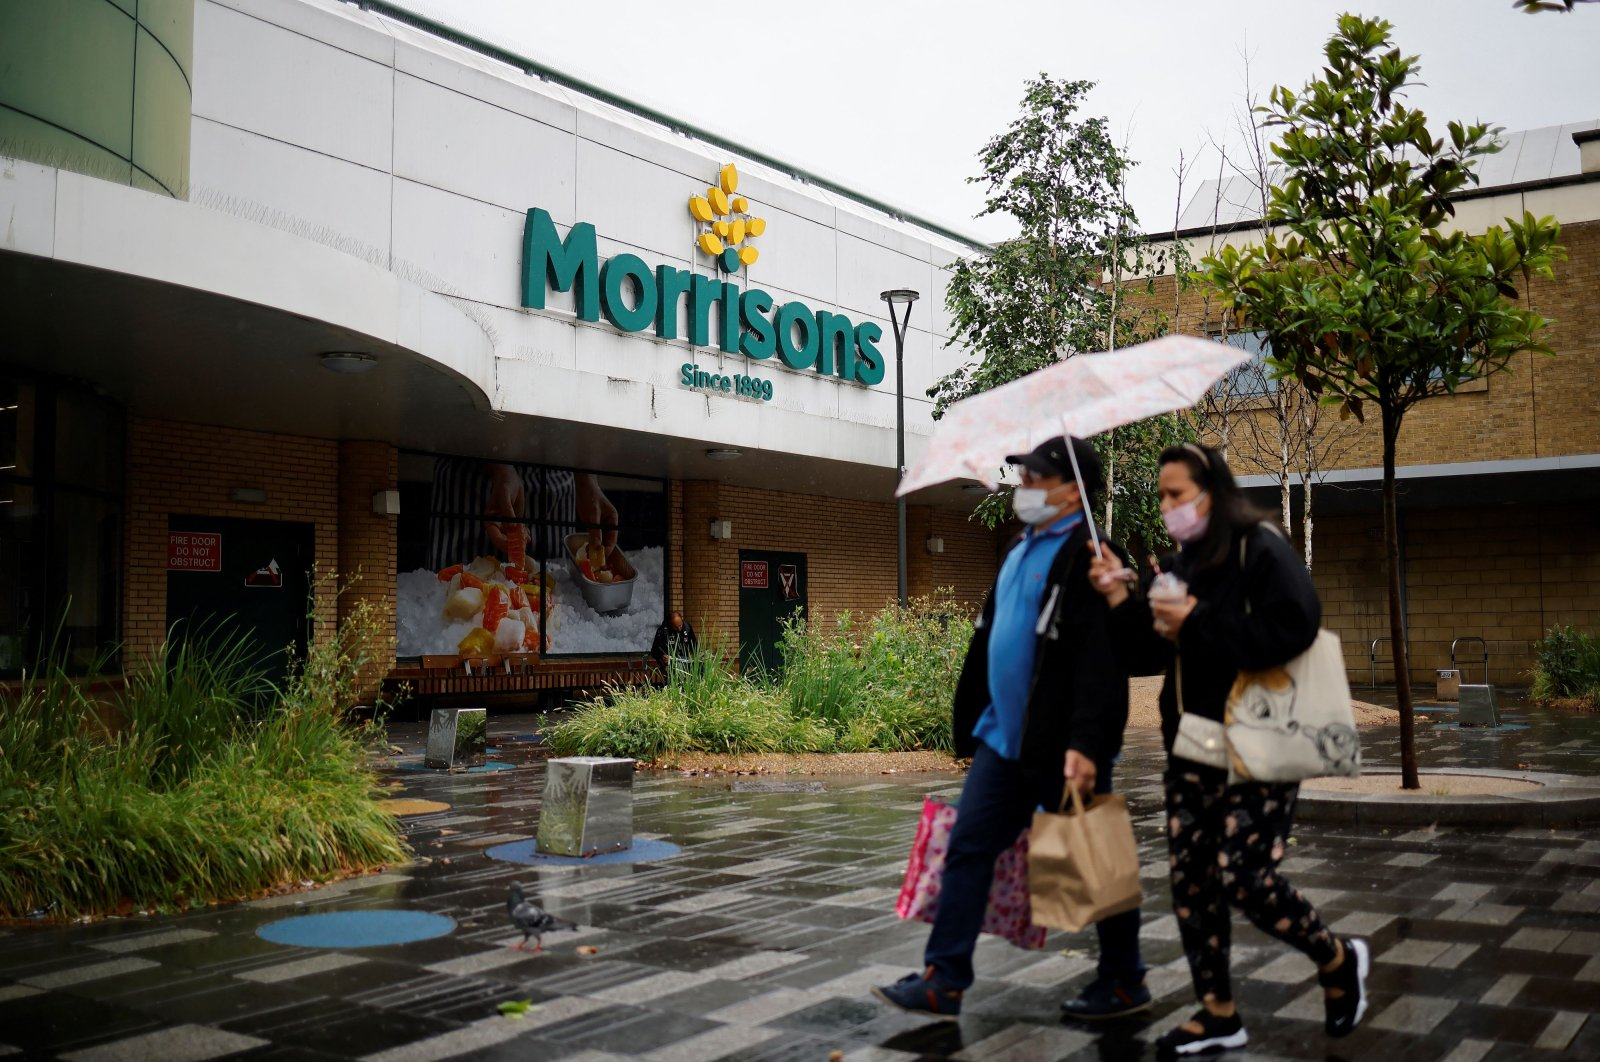 People walk past a Morrisons supermarket in Stratford, east London, June 21, 2021. (AFP Photo)